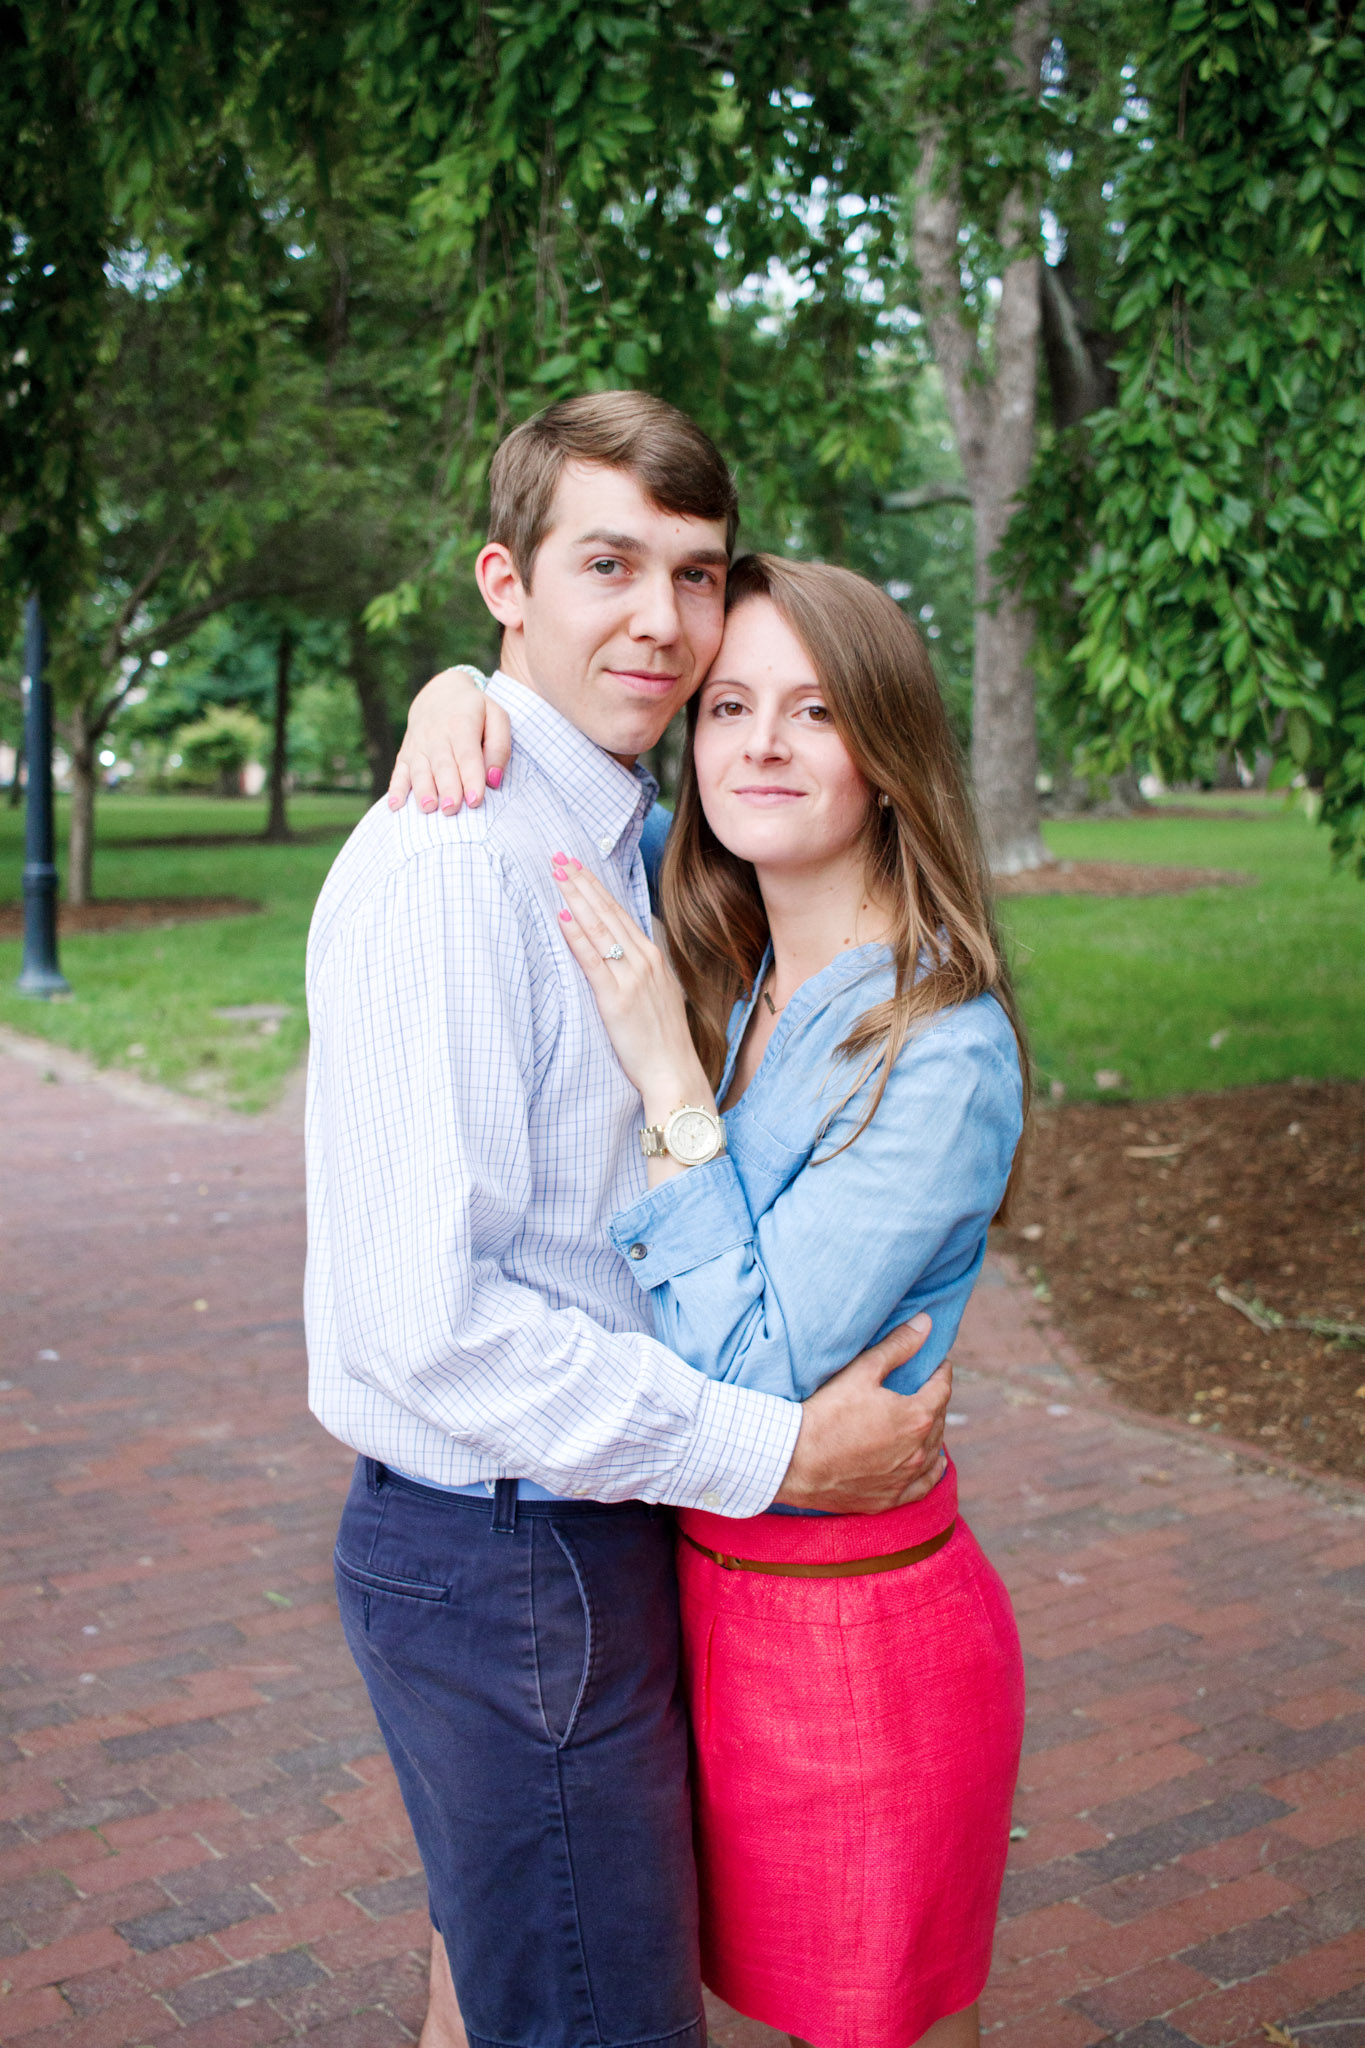 UNC Chapel Hill Engagement Session by Kayli LaFon Photography, Greensboro Photographer